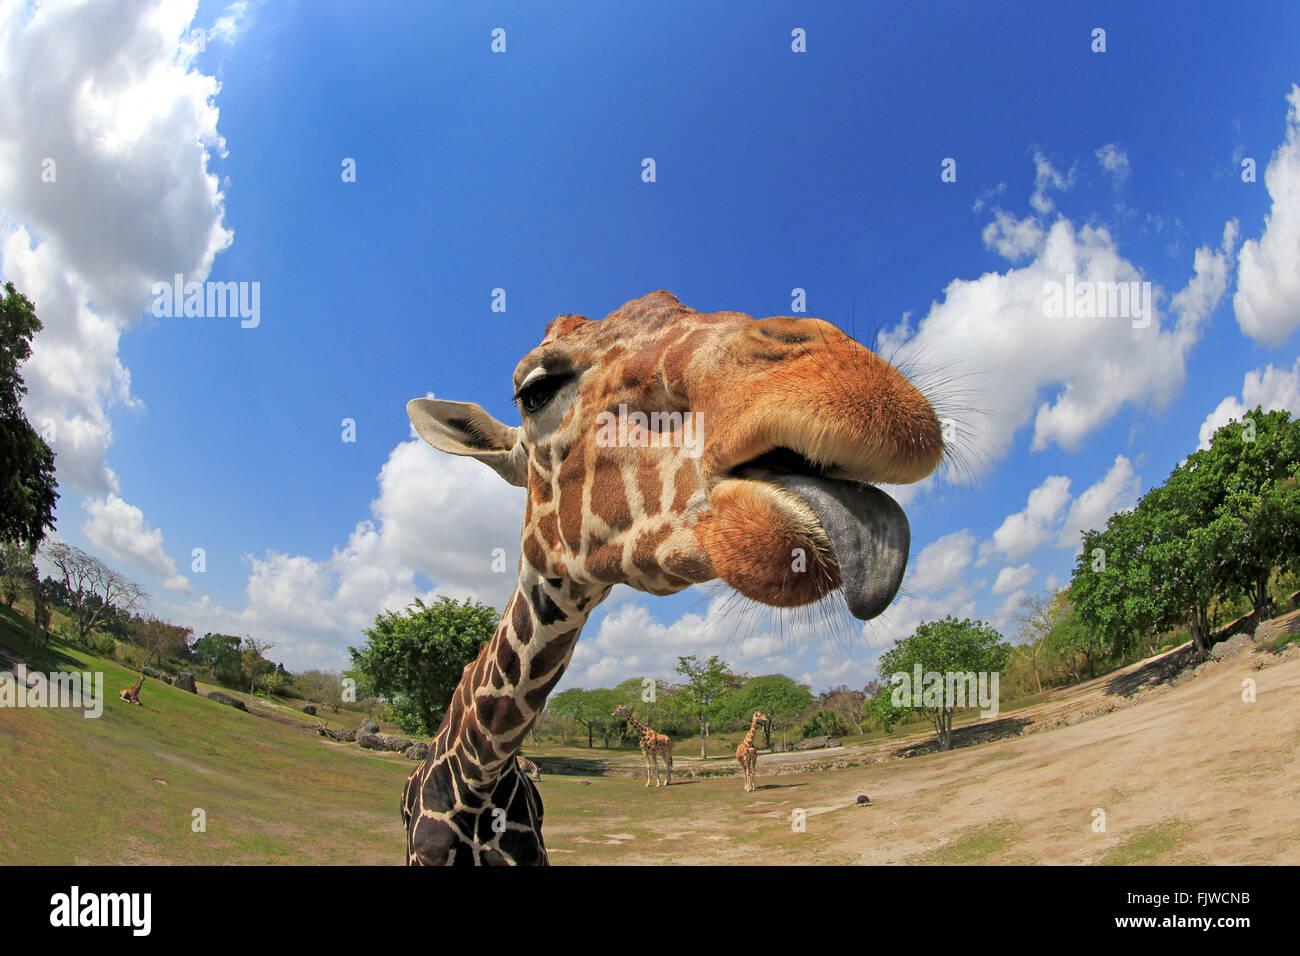 Reticulated Giraffe, adult portrait, Africa / (Giraffa camelopardalis reticulata) Stock Photo